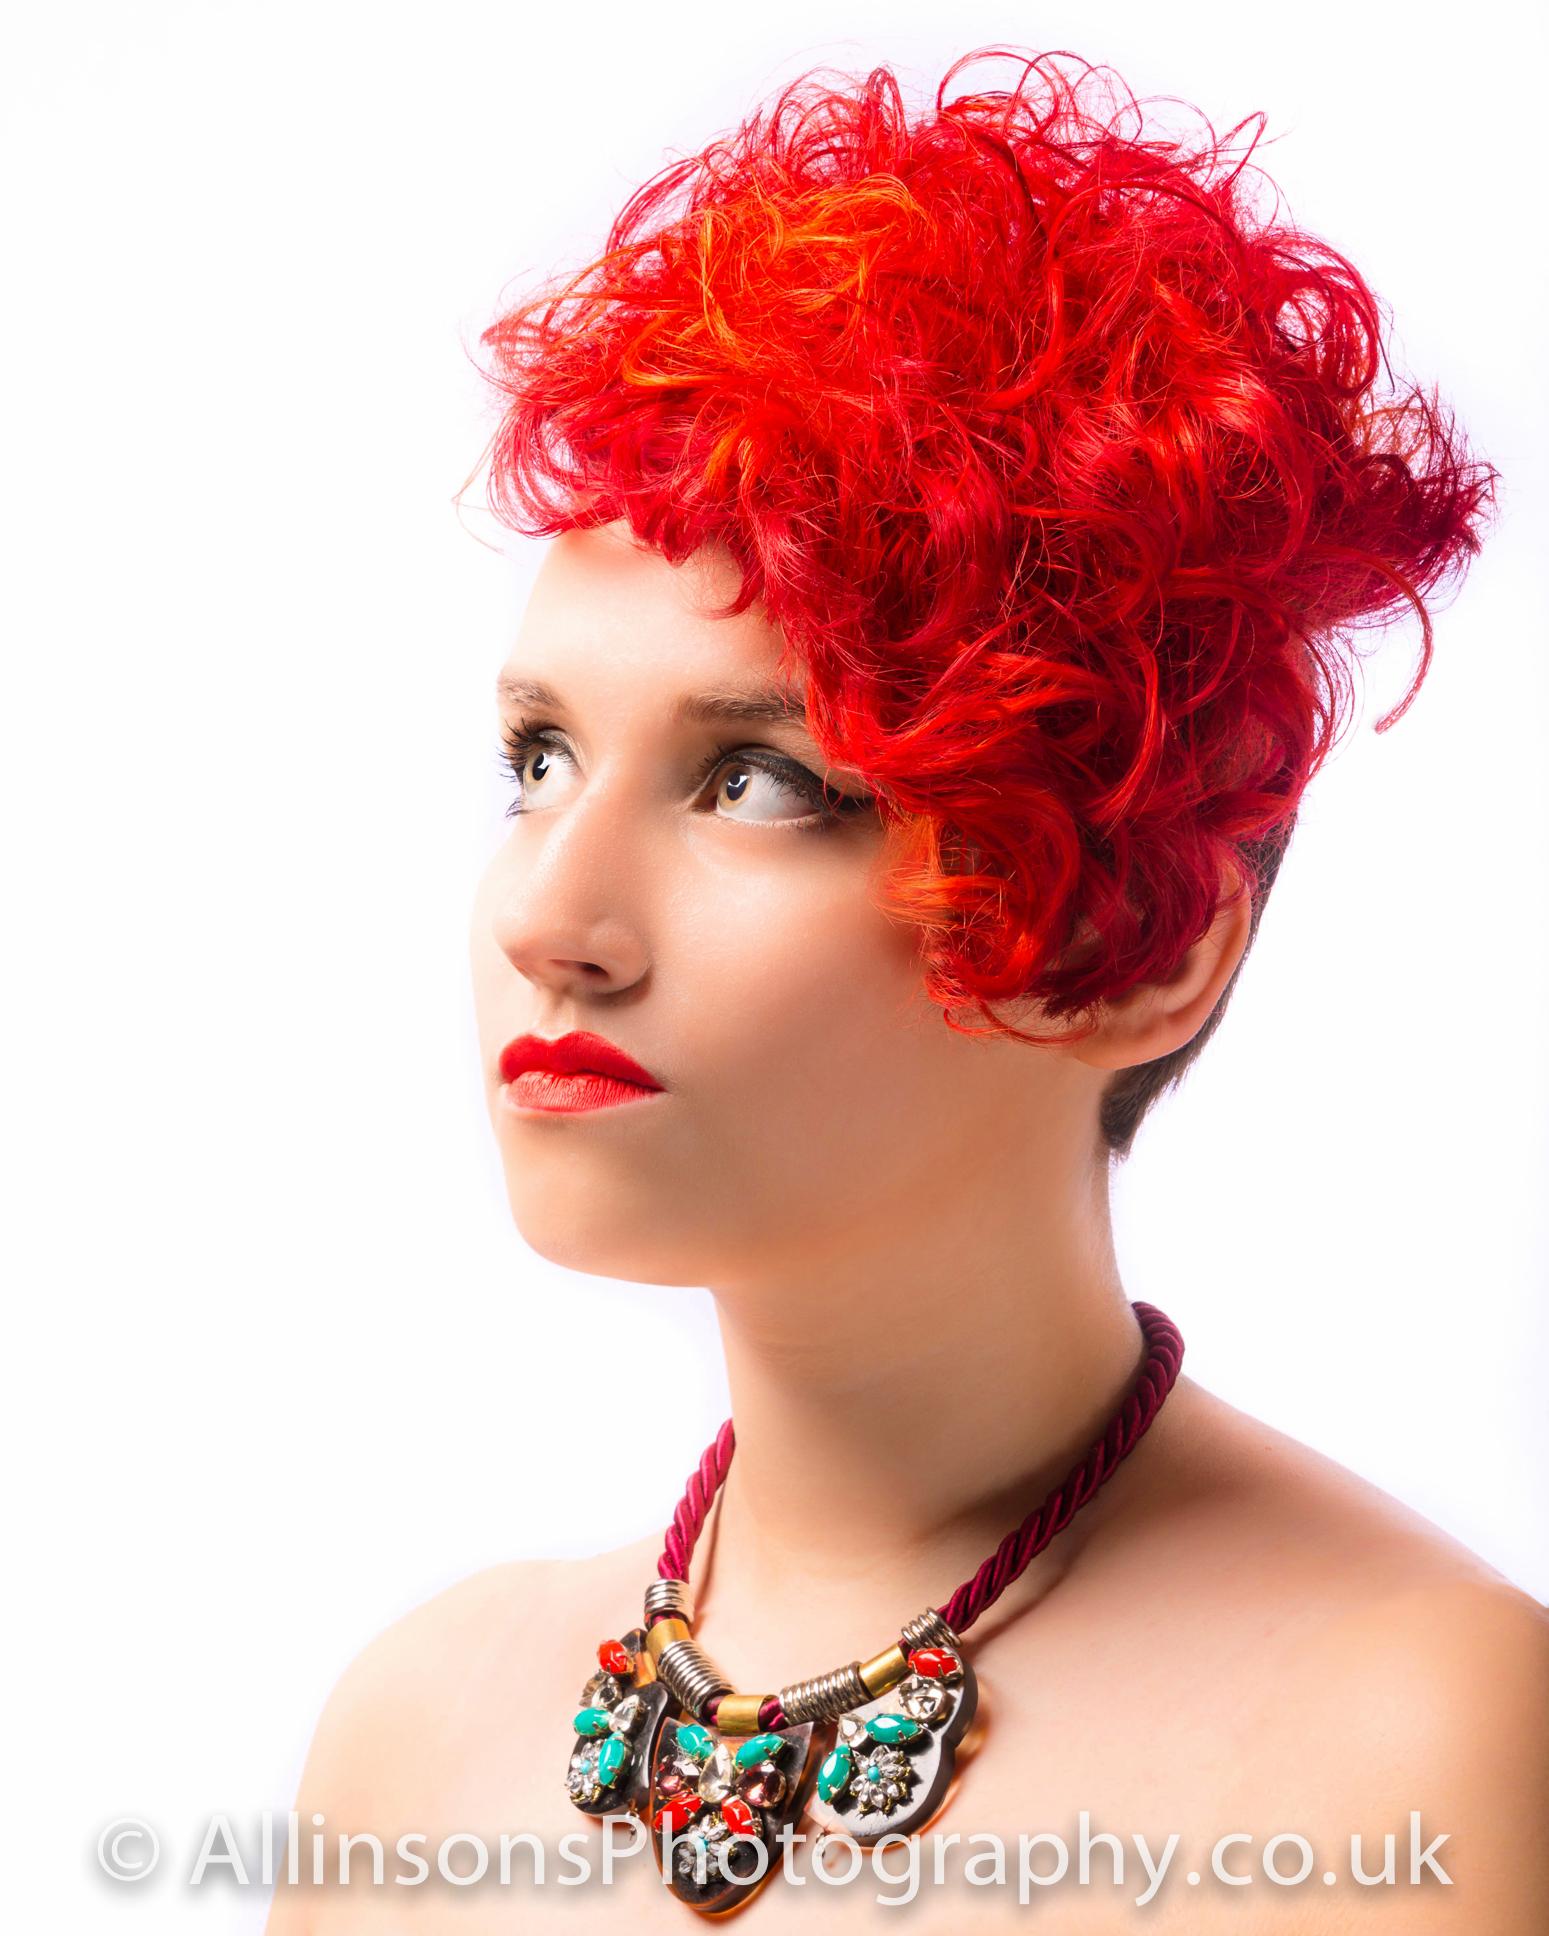 Hair Stylist Hairdresser In Newcastle Hairdressing